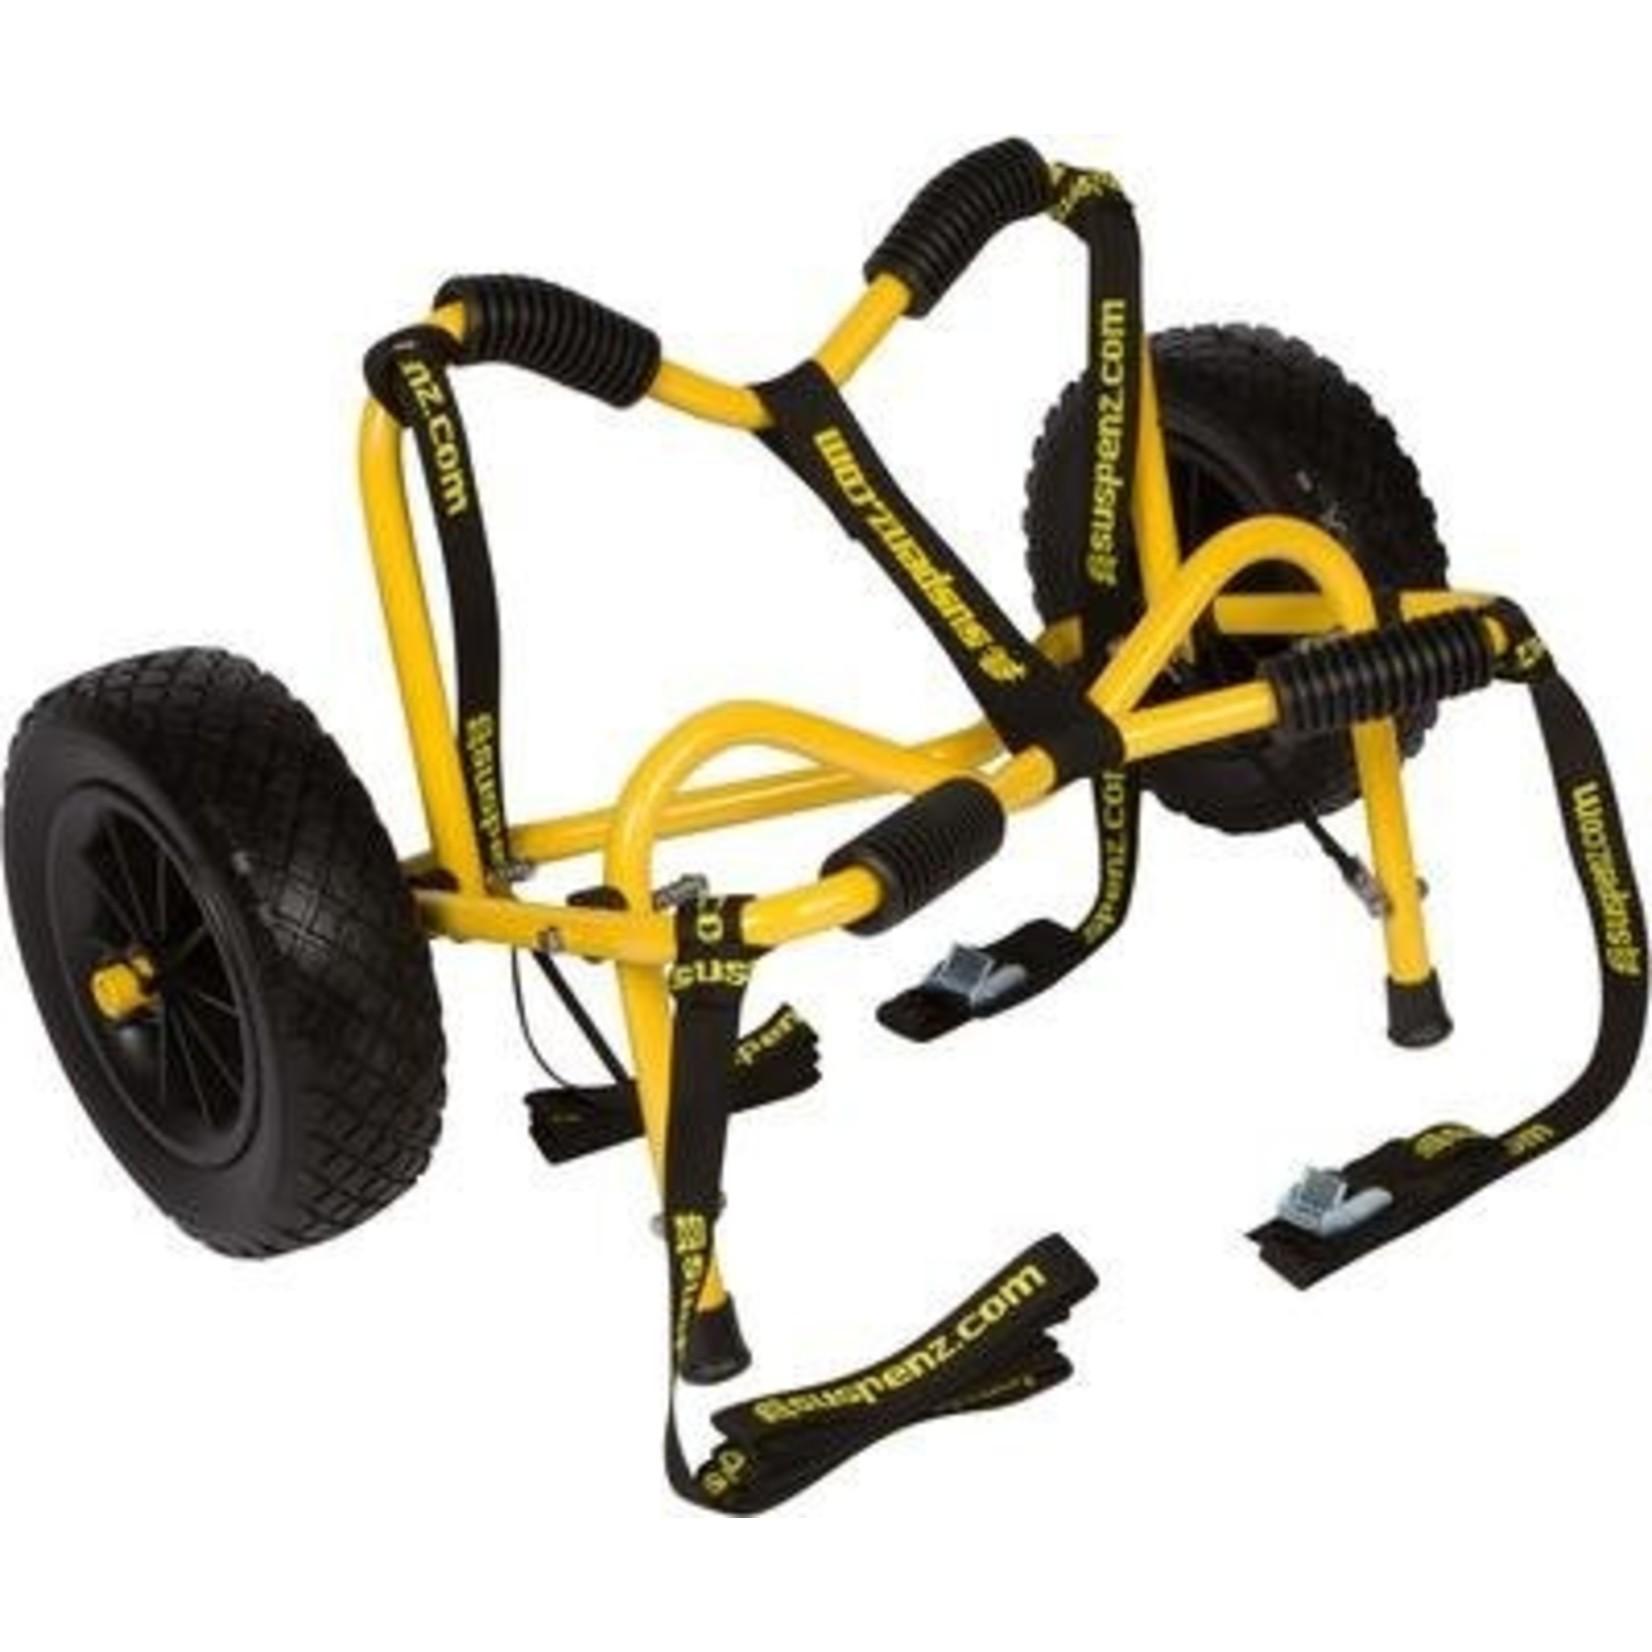 Suspenz, Inc. Suspenz Smart Airless DLX Cart